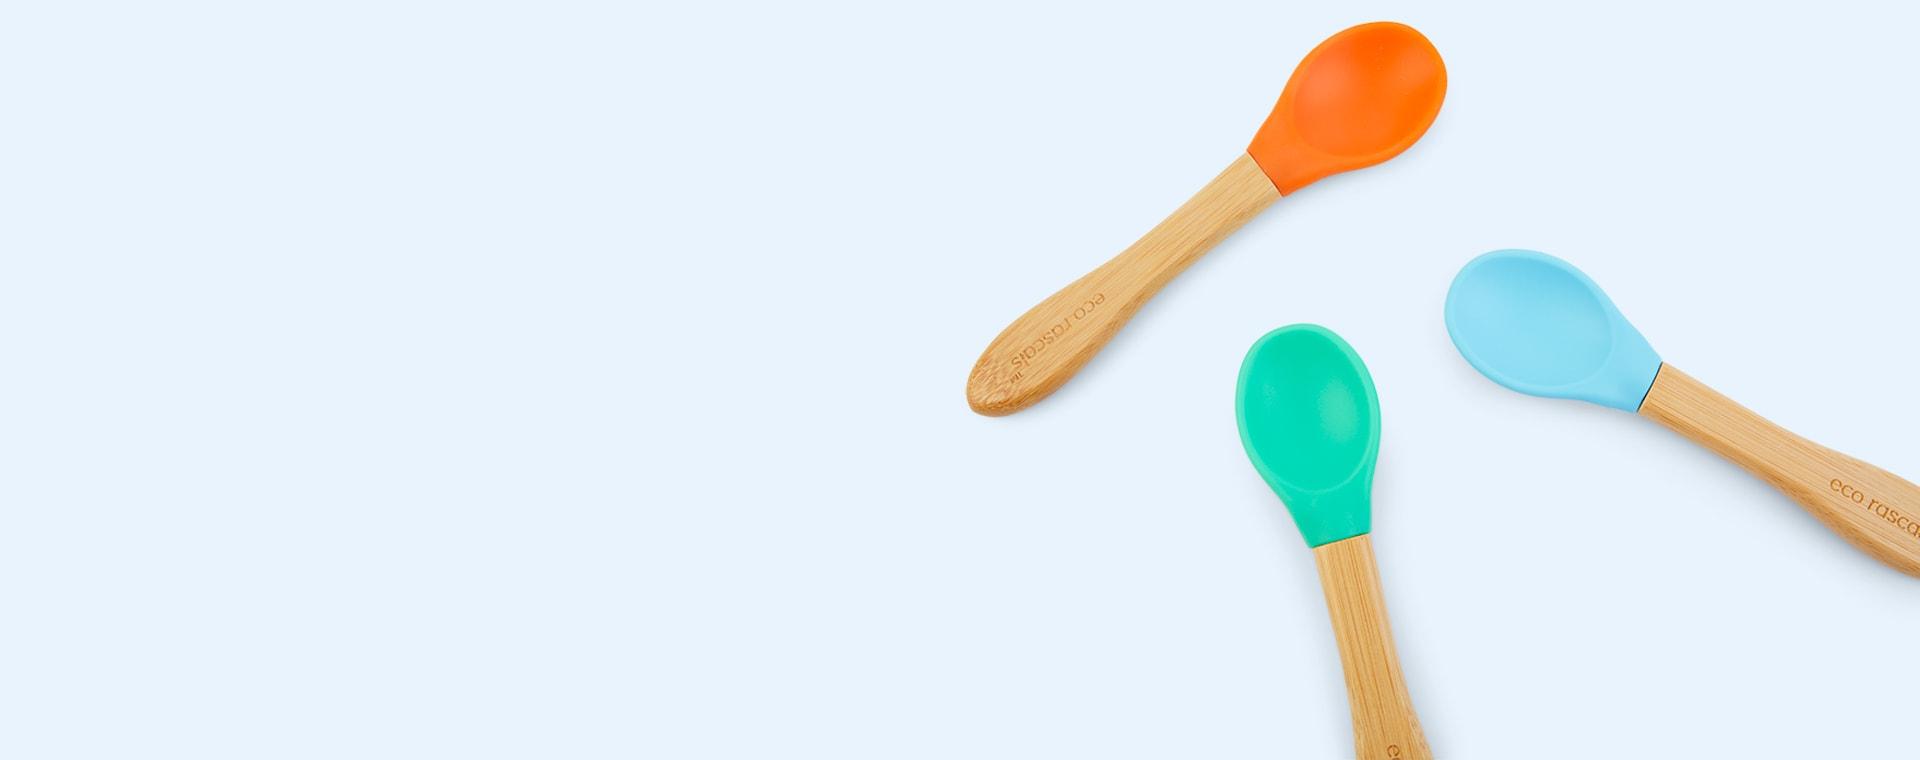 Blue, Green, Orange eco rascals 3-Pack Bamboo Spoons